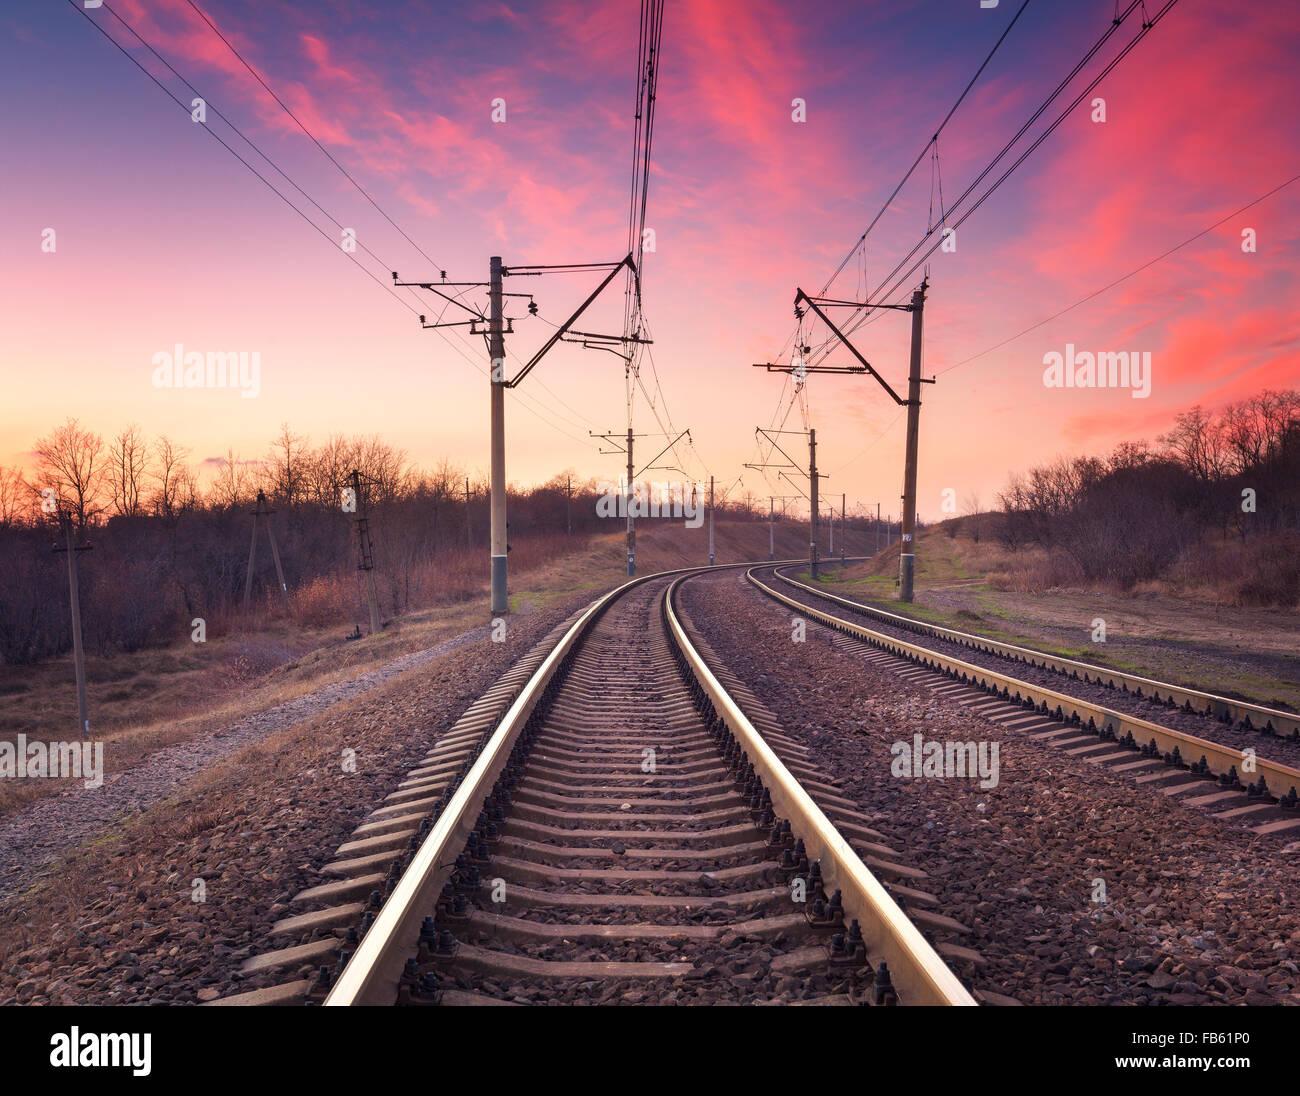 Train platform at sunset. Railroad in Ukraine. Railway landscape. - Stock Image